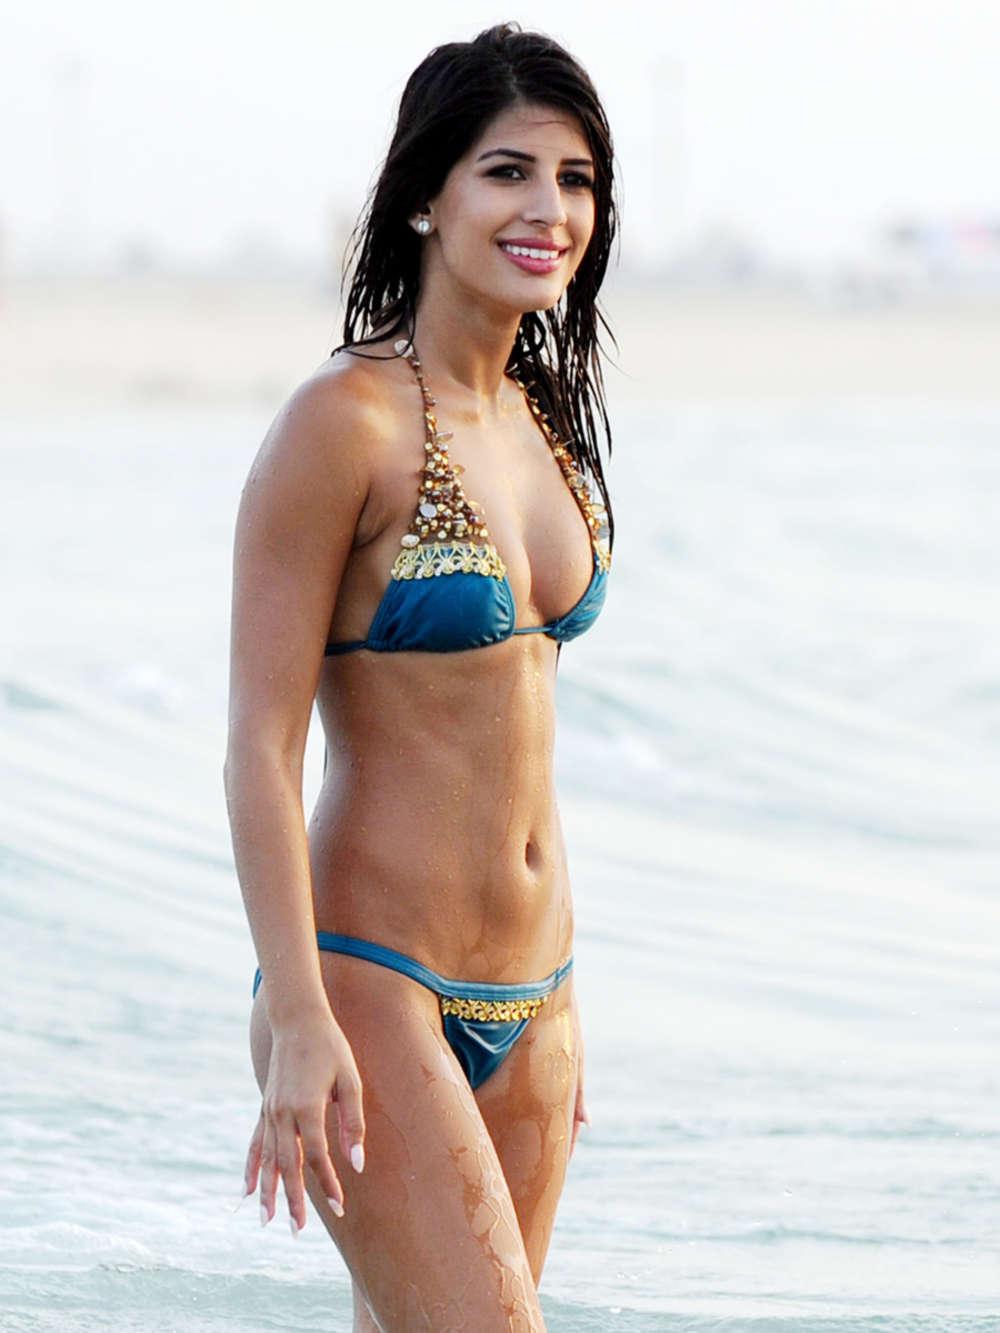 Beautiful Girl Wallpaper Santa Banta Jasmin Walia In Bikini 02 Gotceleb